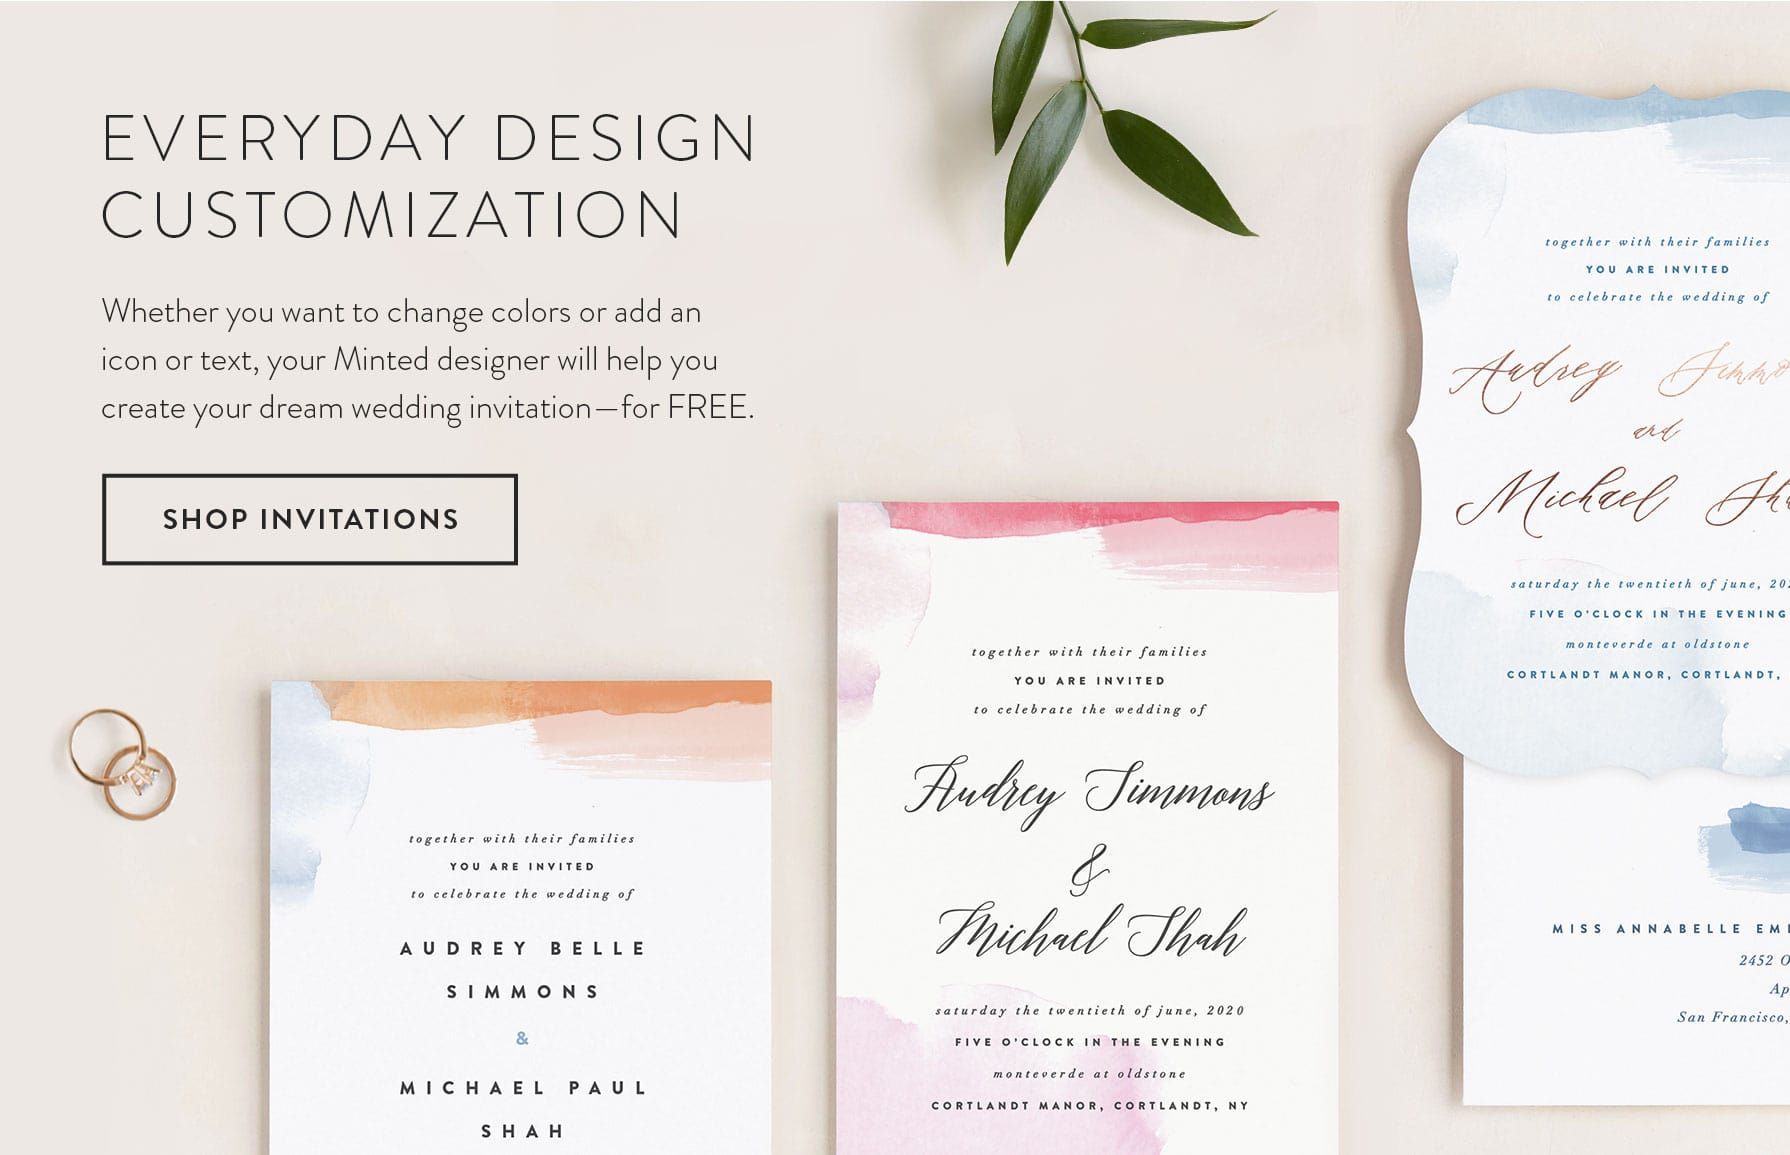 Everyday Design Customization